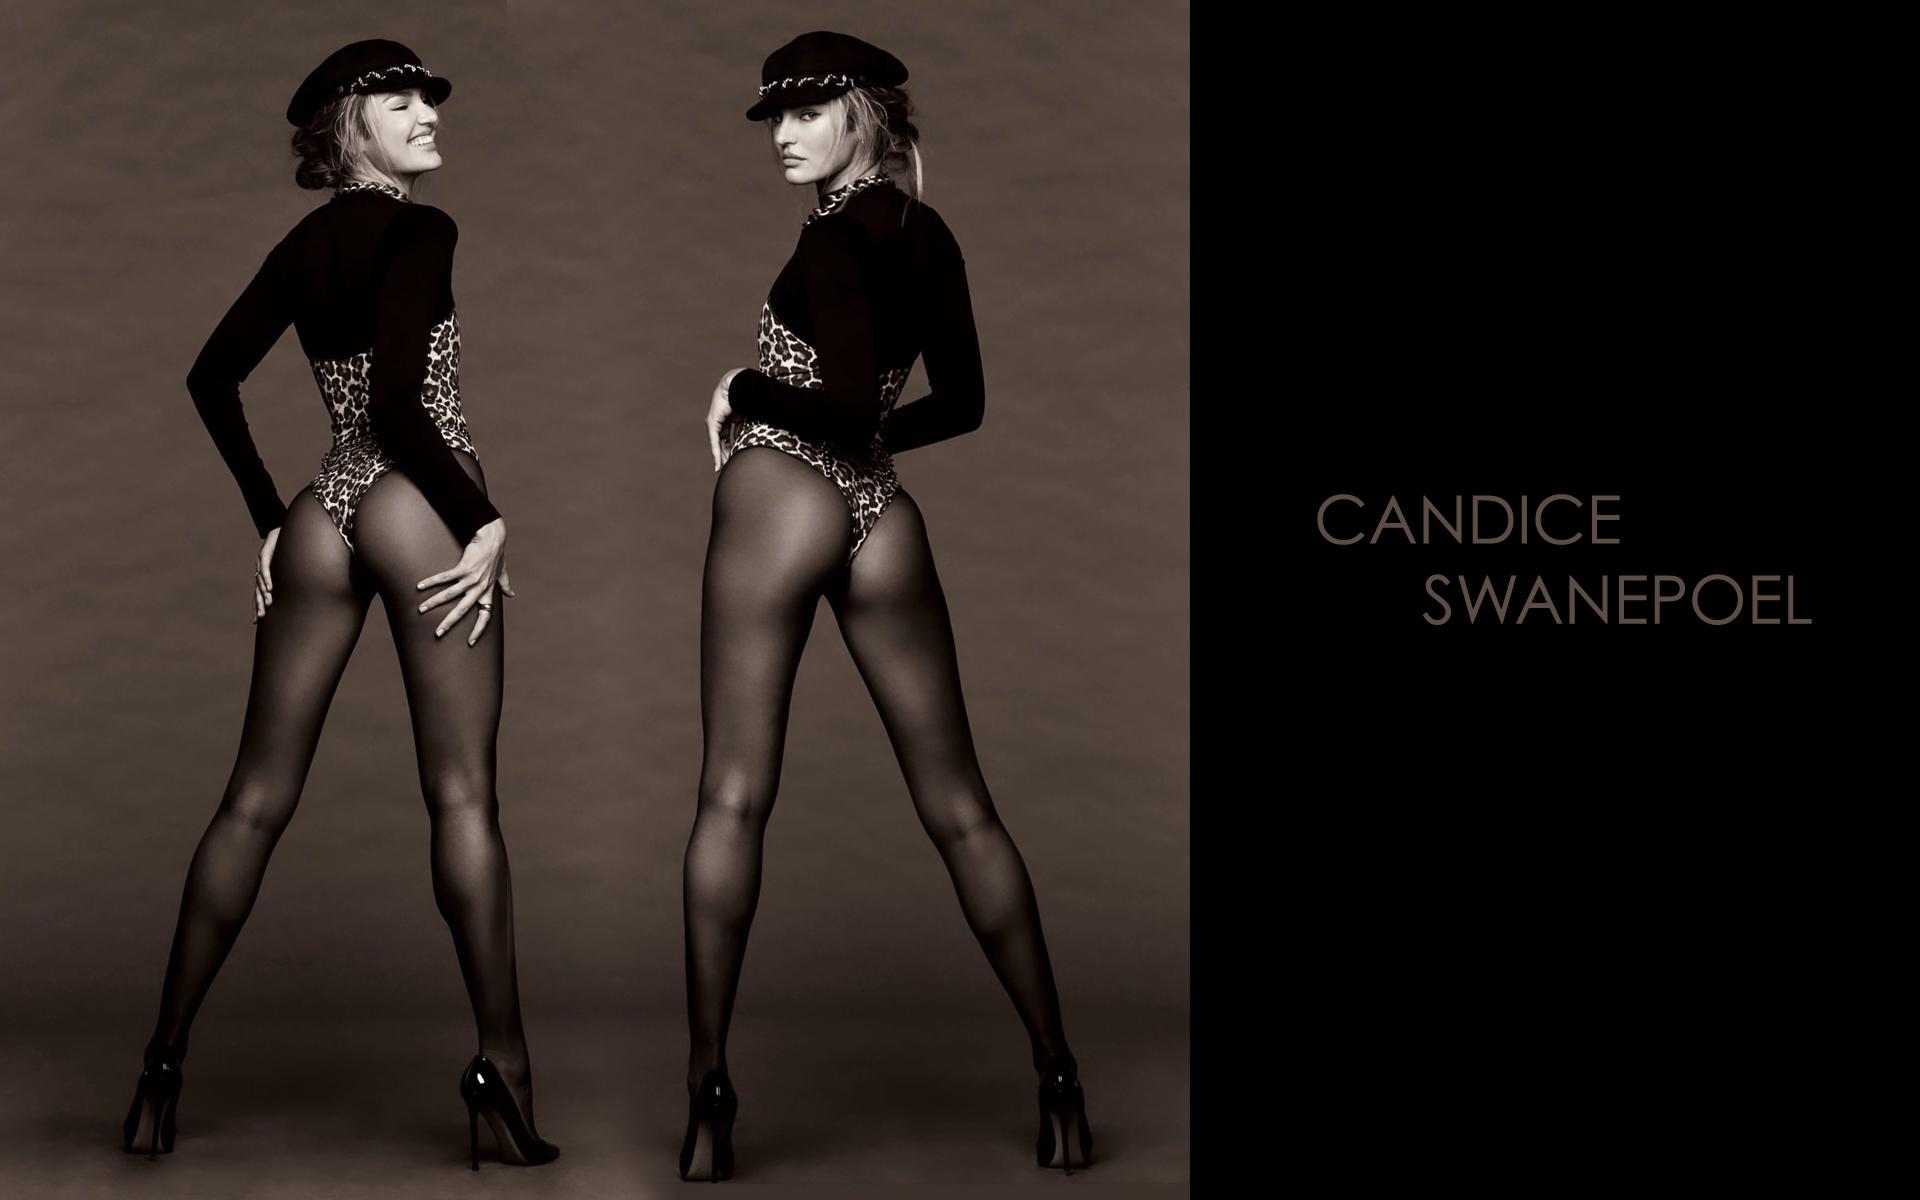 candice swanepoel217.jpg